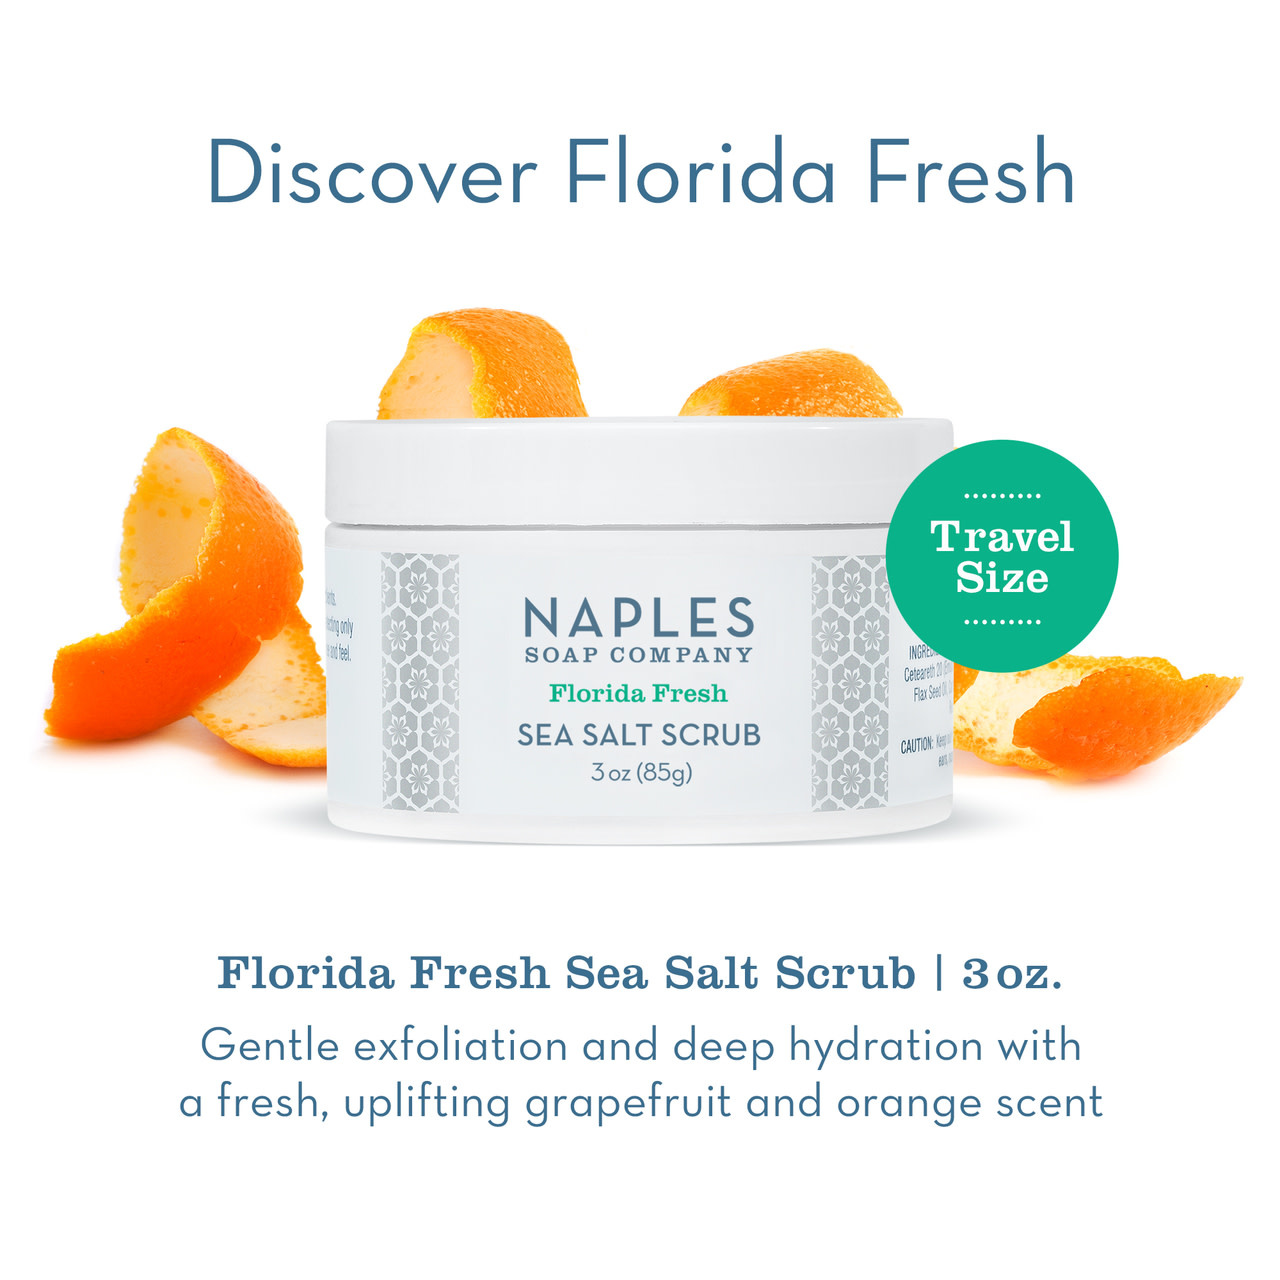 Naples Soap Co. Florida Fresh Sea Salt Scrub 3 oz